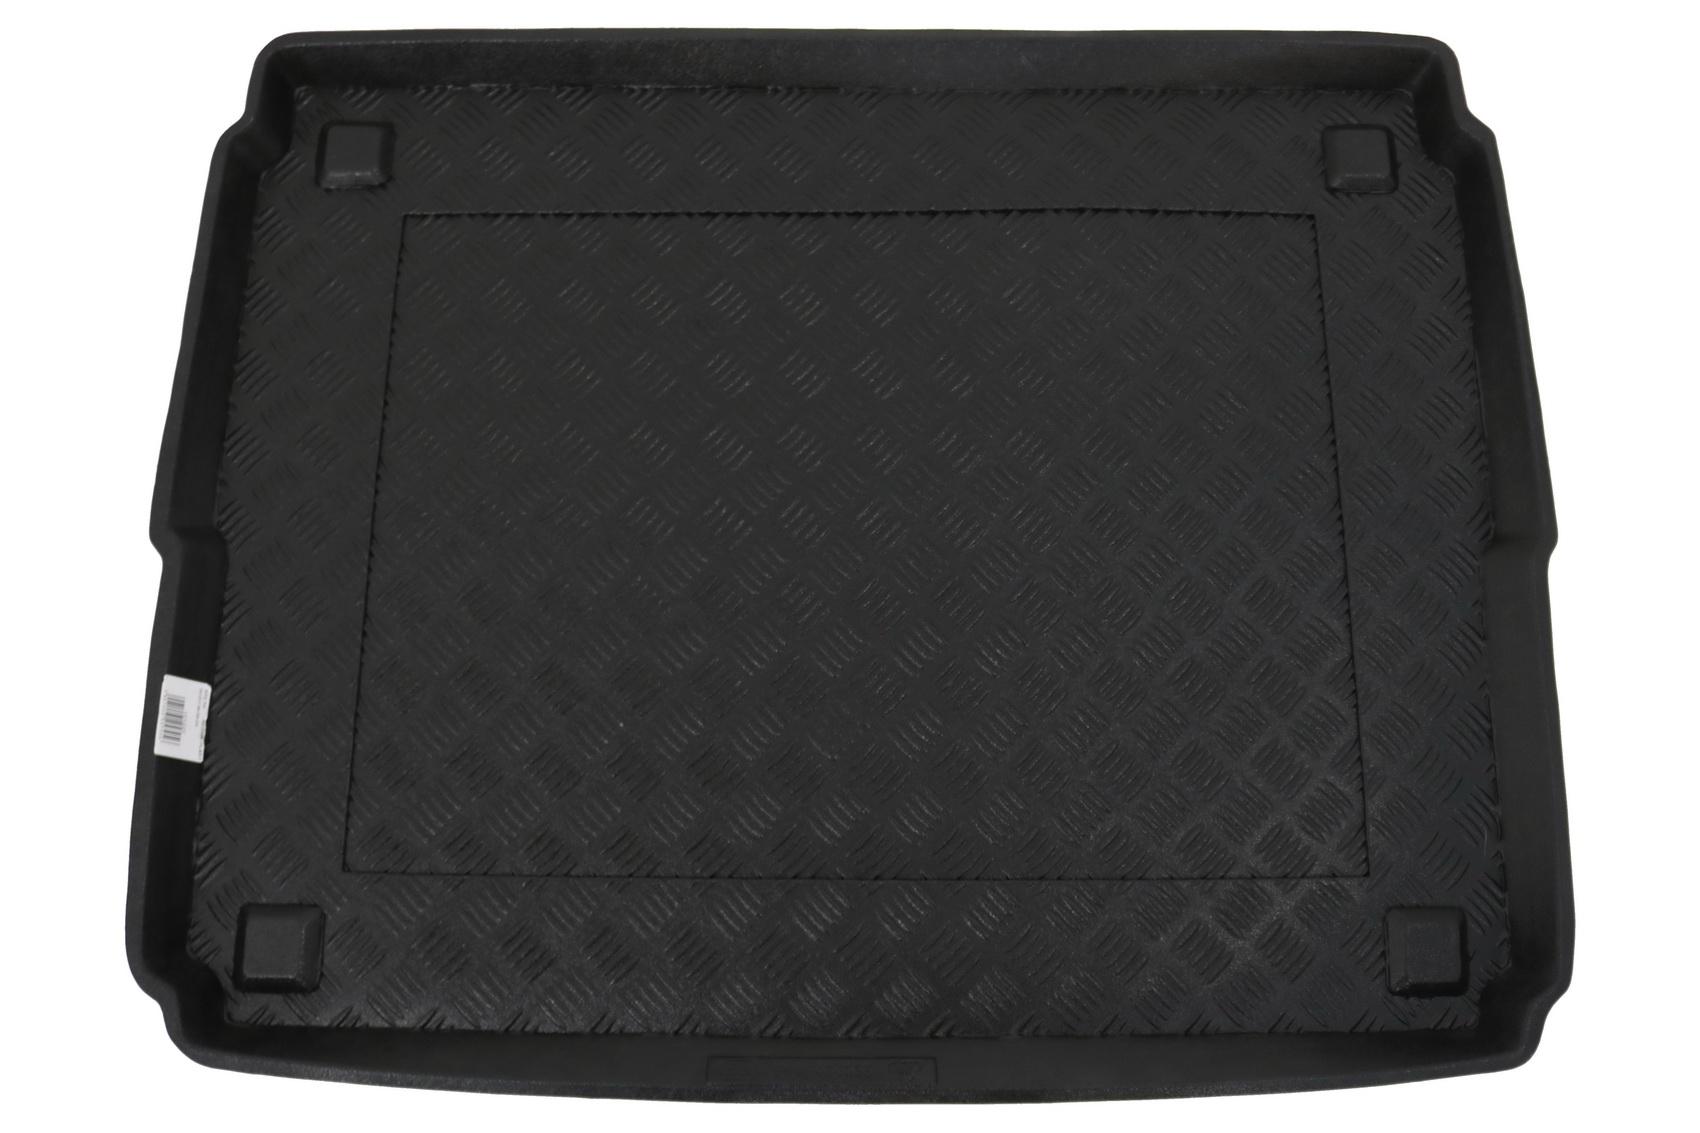 Covoras tavita portbagaj compatibil cu PEUGEOT compatibil cu PEUGEOT 3008 (2009-2016)